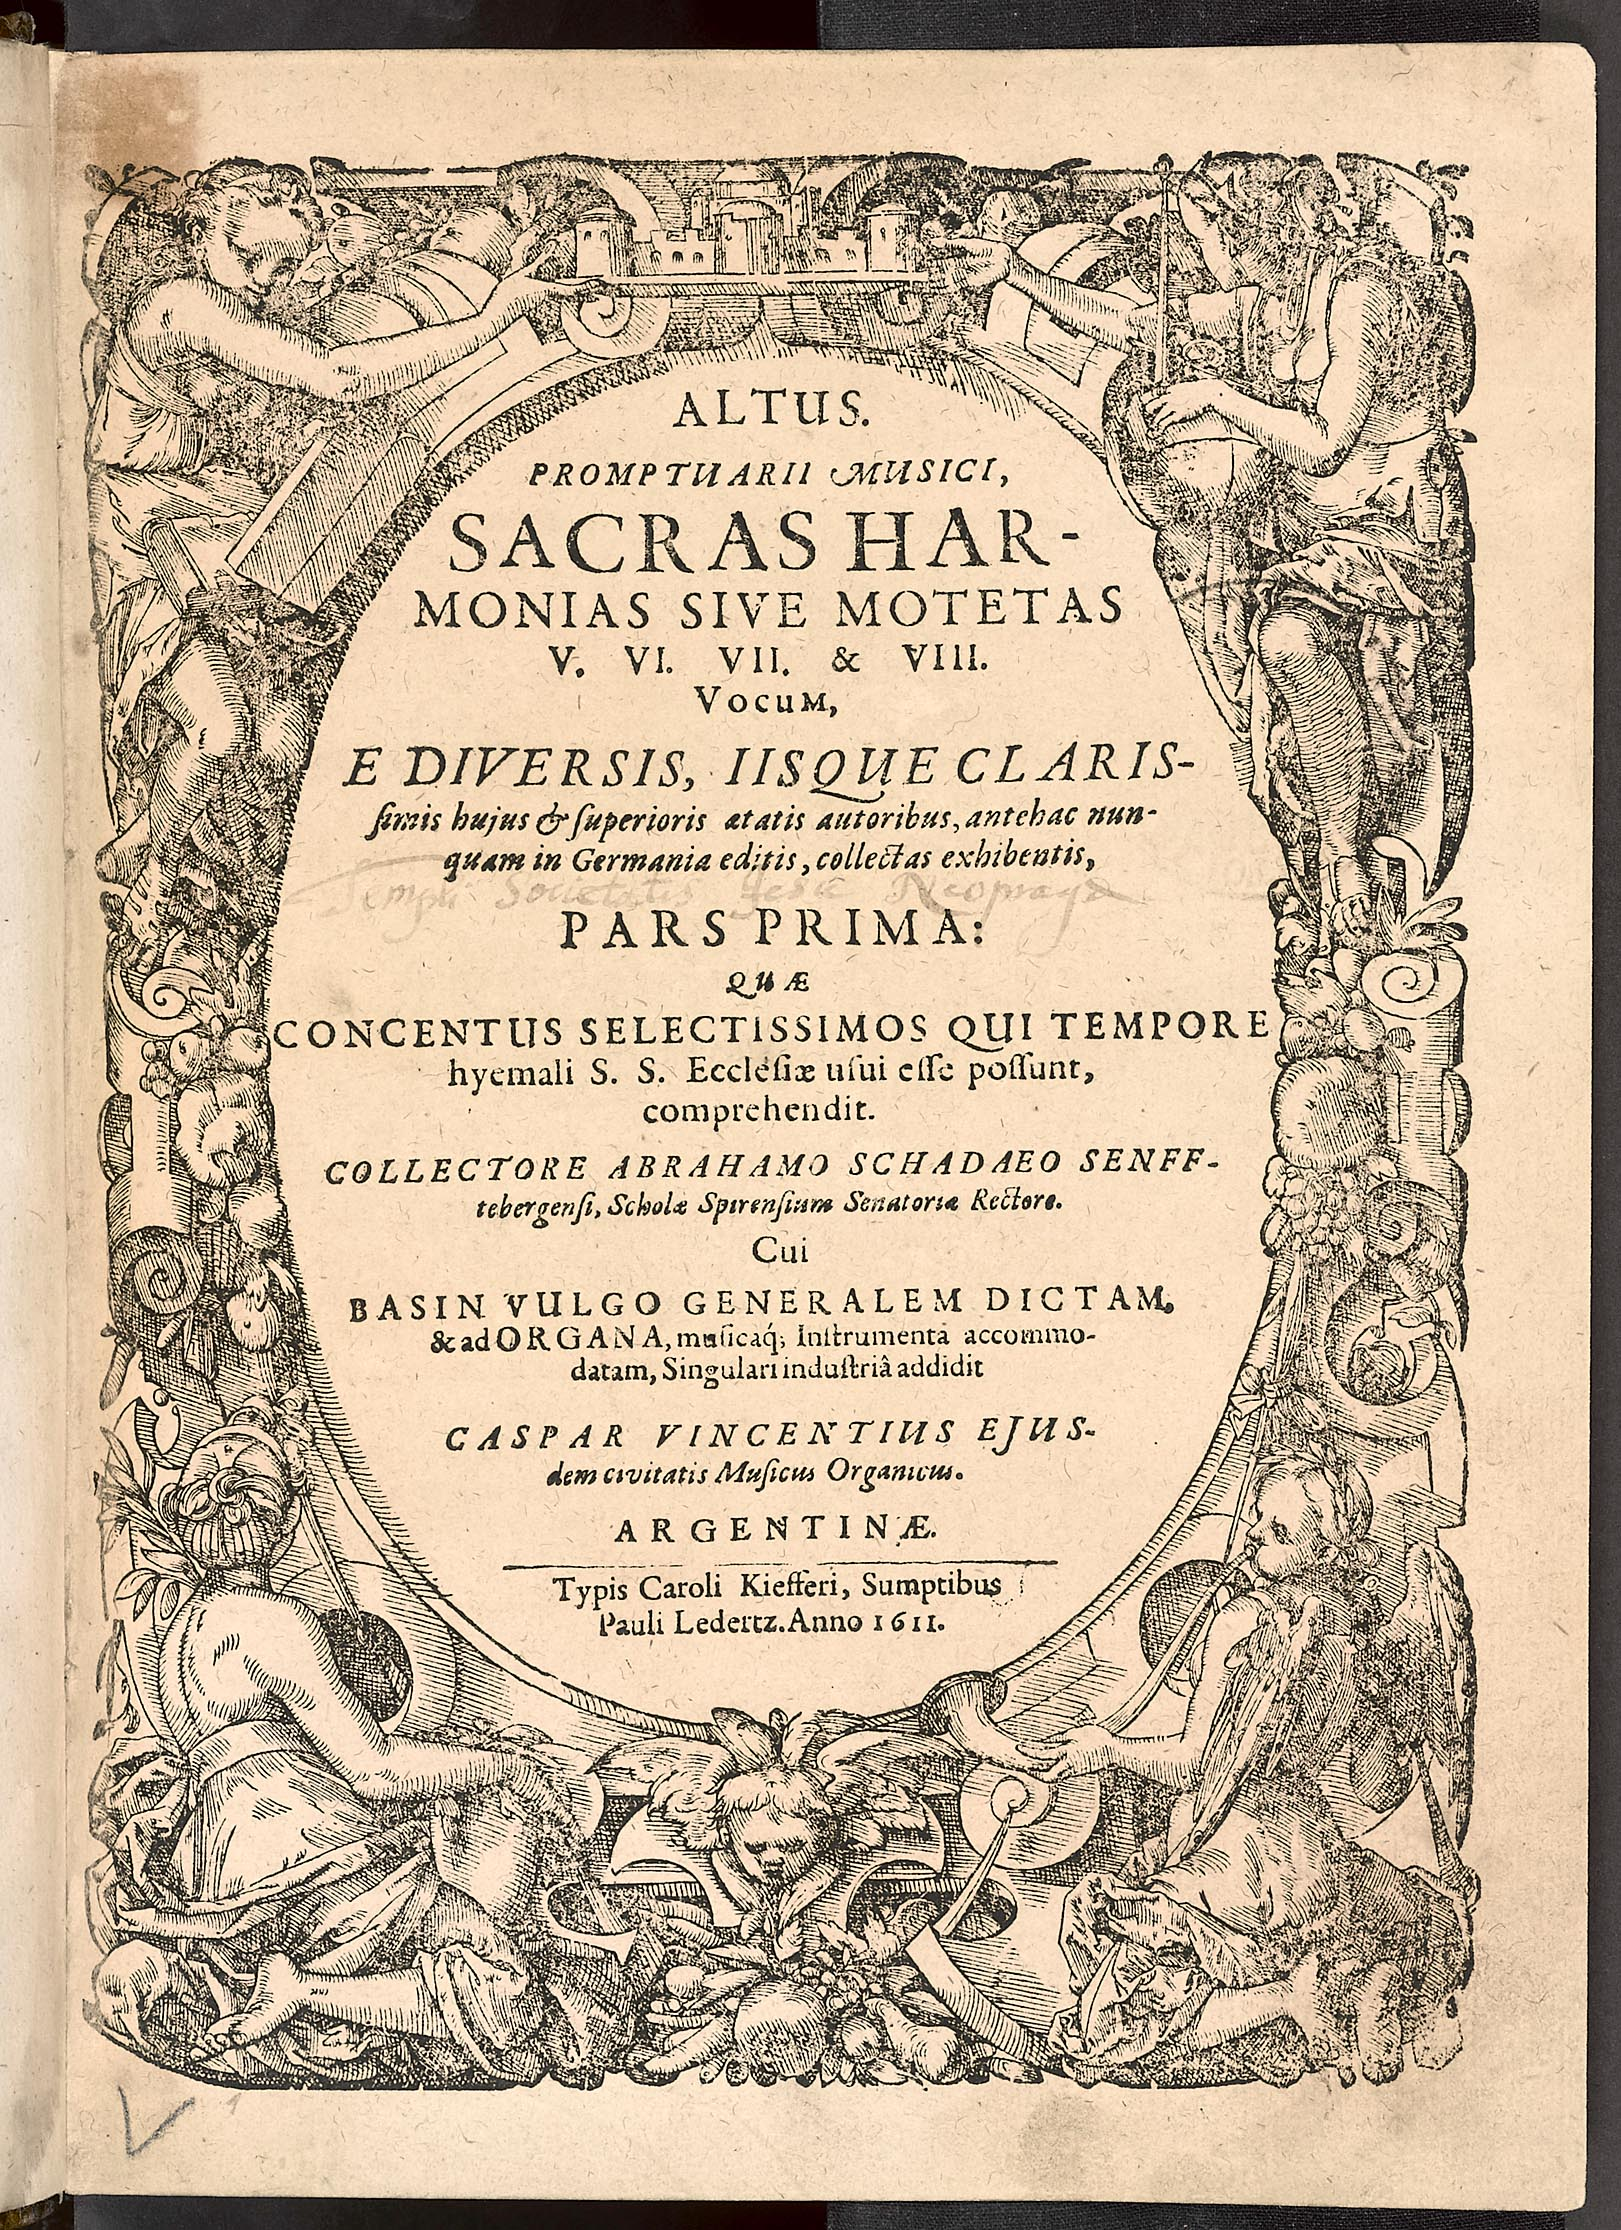 Promptuarii musici sacras harmonias sive motetas ... Altus (Konvolut hlasových knih)